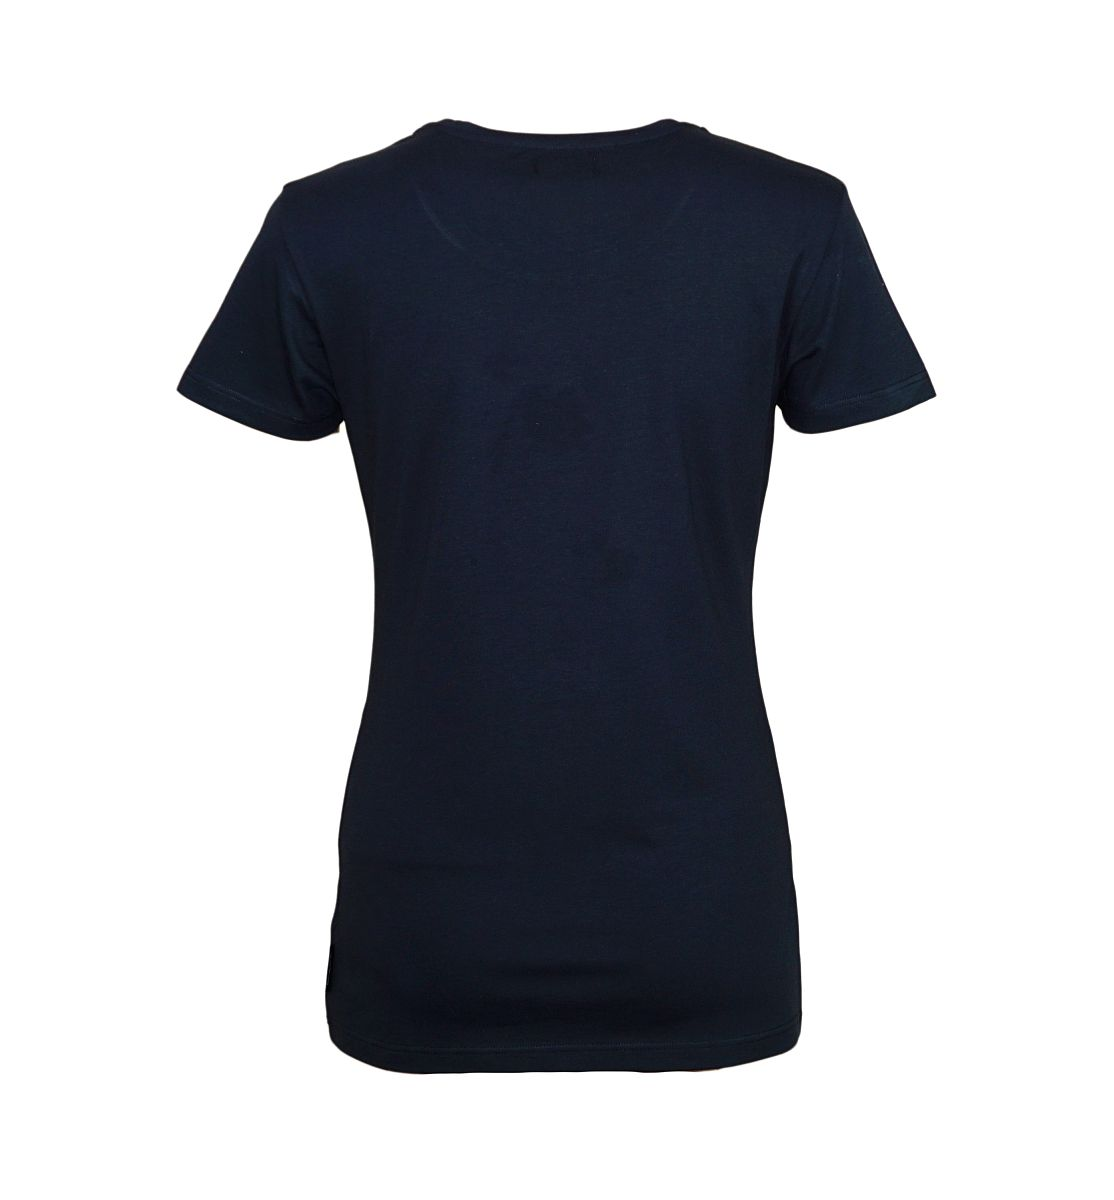 Emporio Armani Damen Shirt T-Shirt Rundhals 163924 7A217 00135 MARINE HW17-EADS1